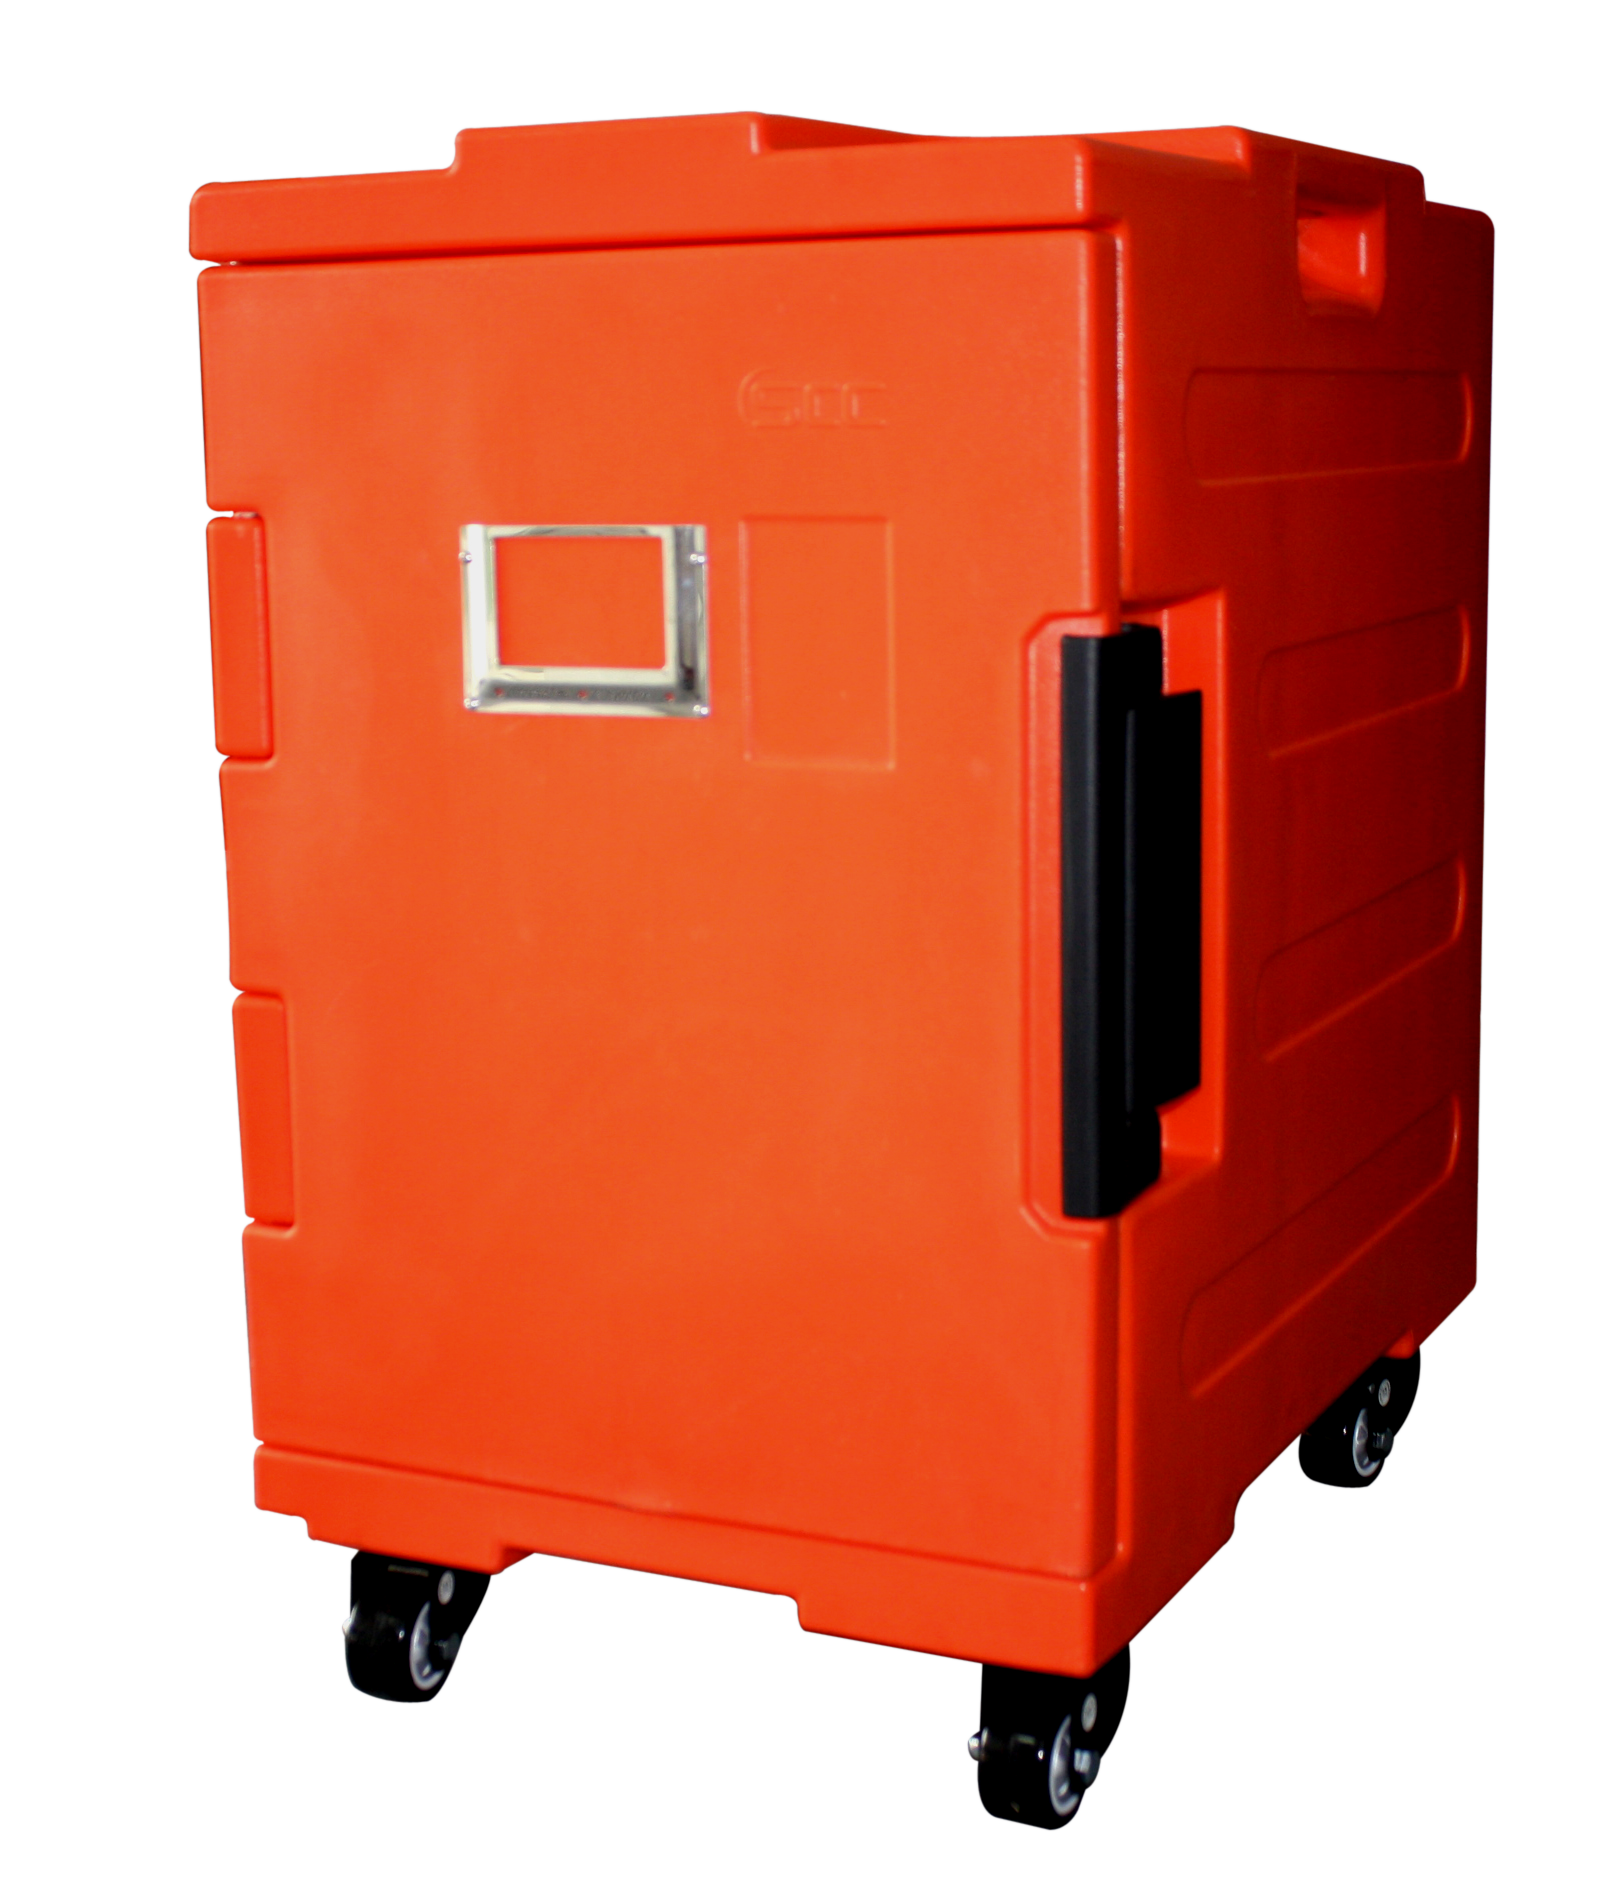 86L insulated cabinet SB2-B90T